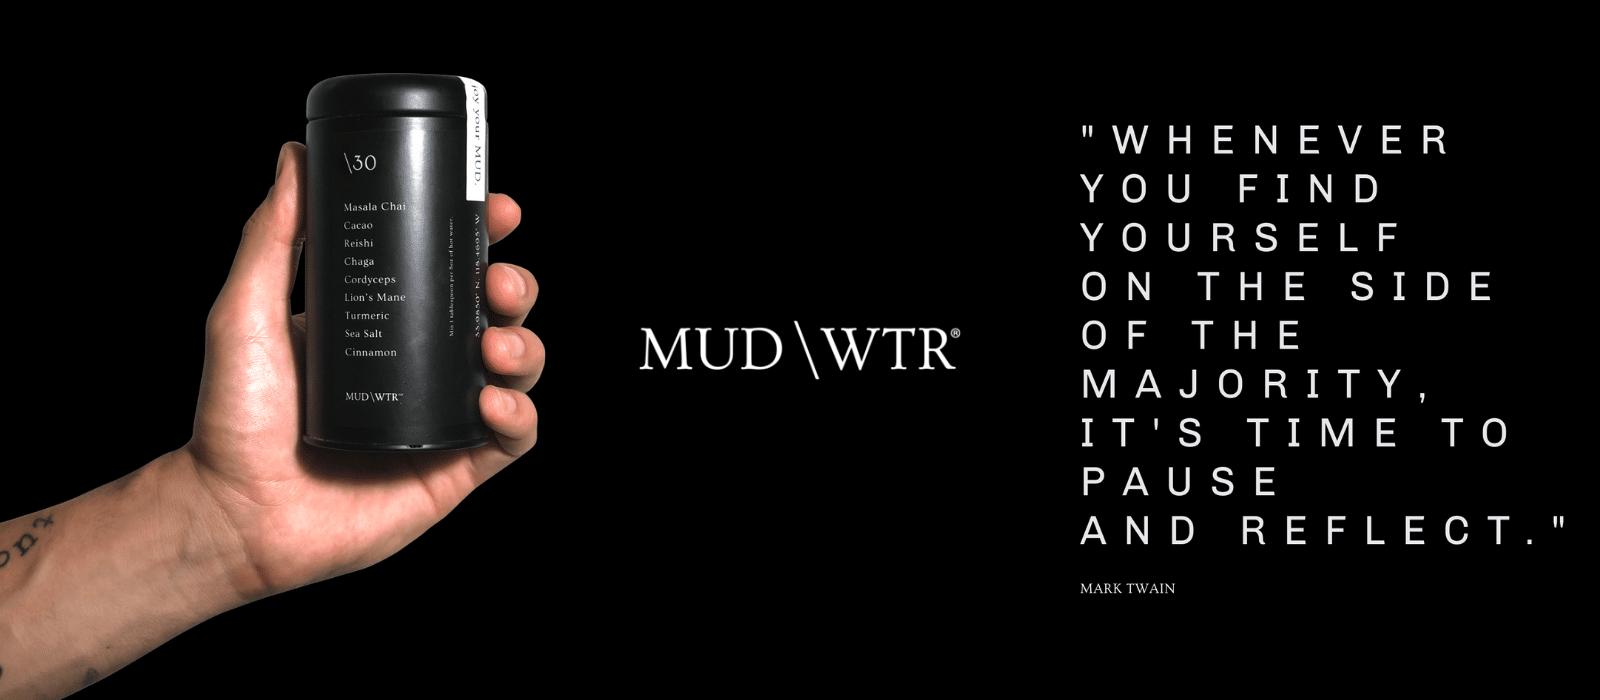 Mudwtr Review